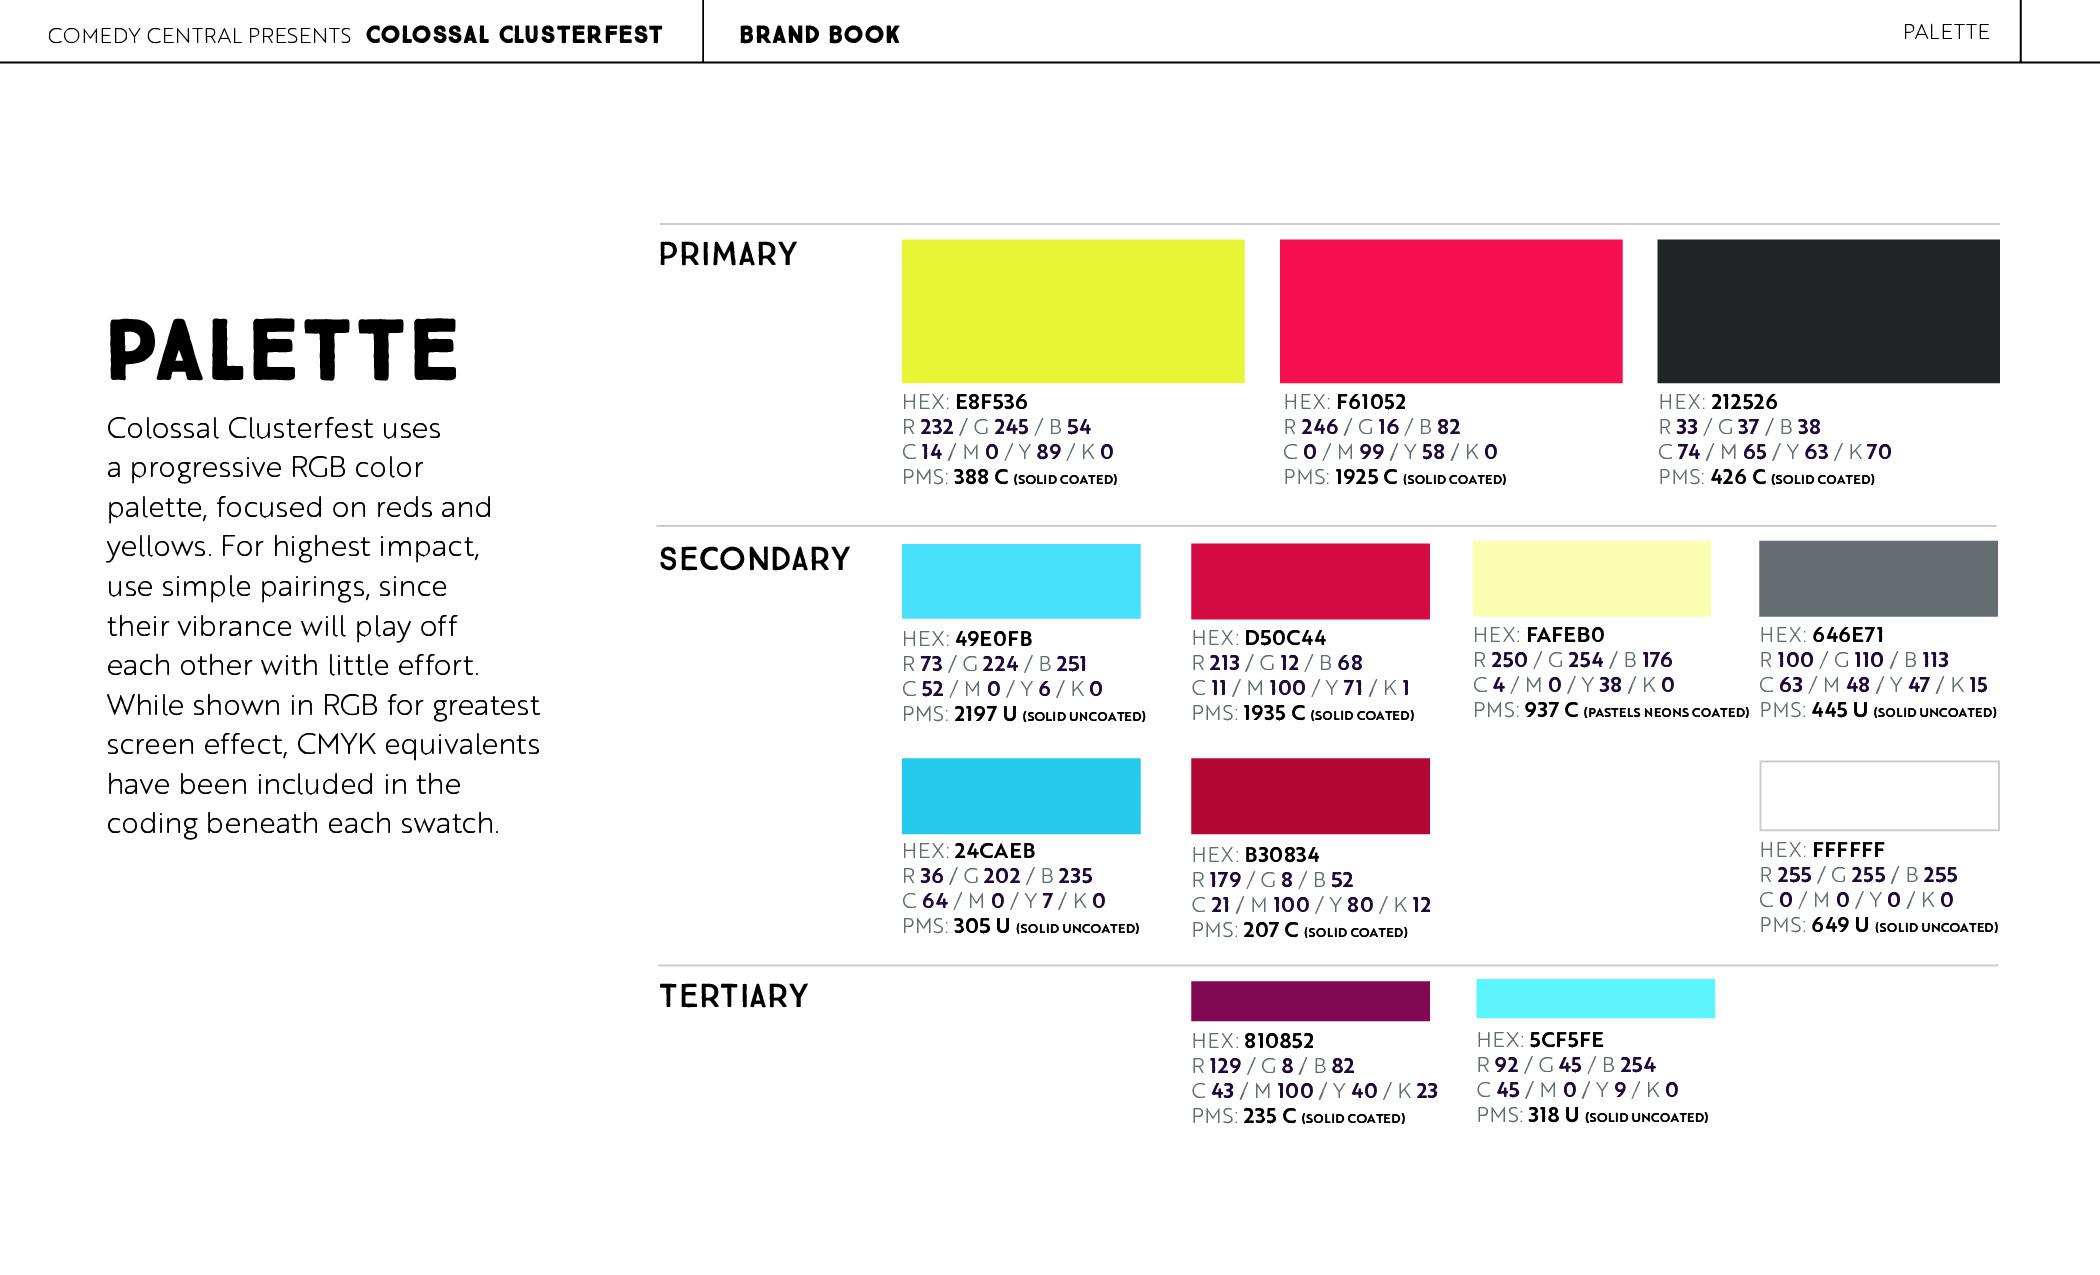 BrandBook-ClusterfestPalette.jpg